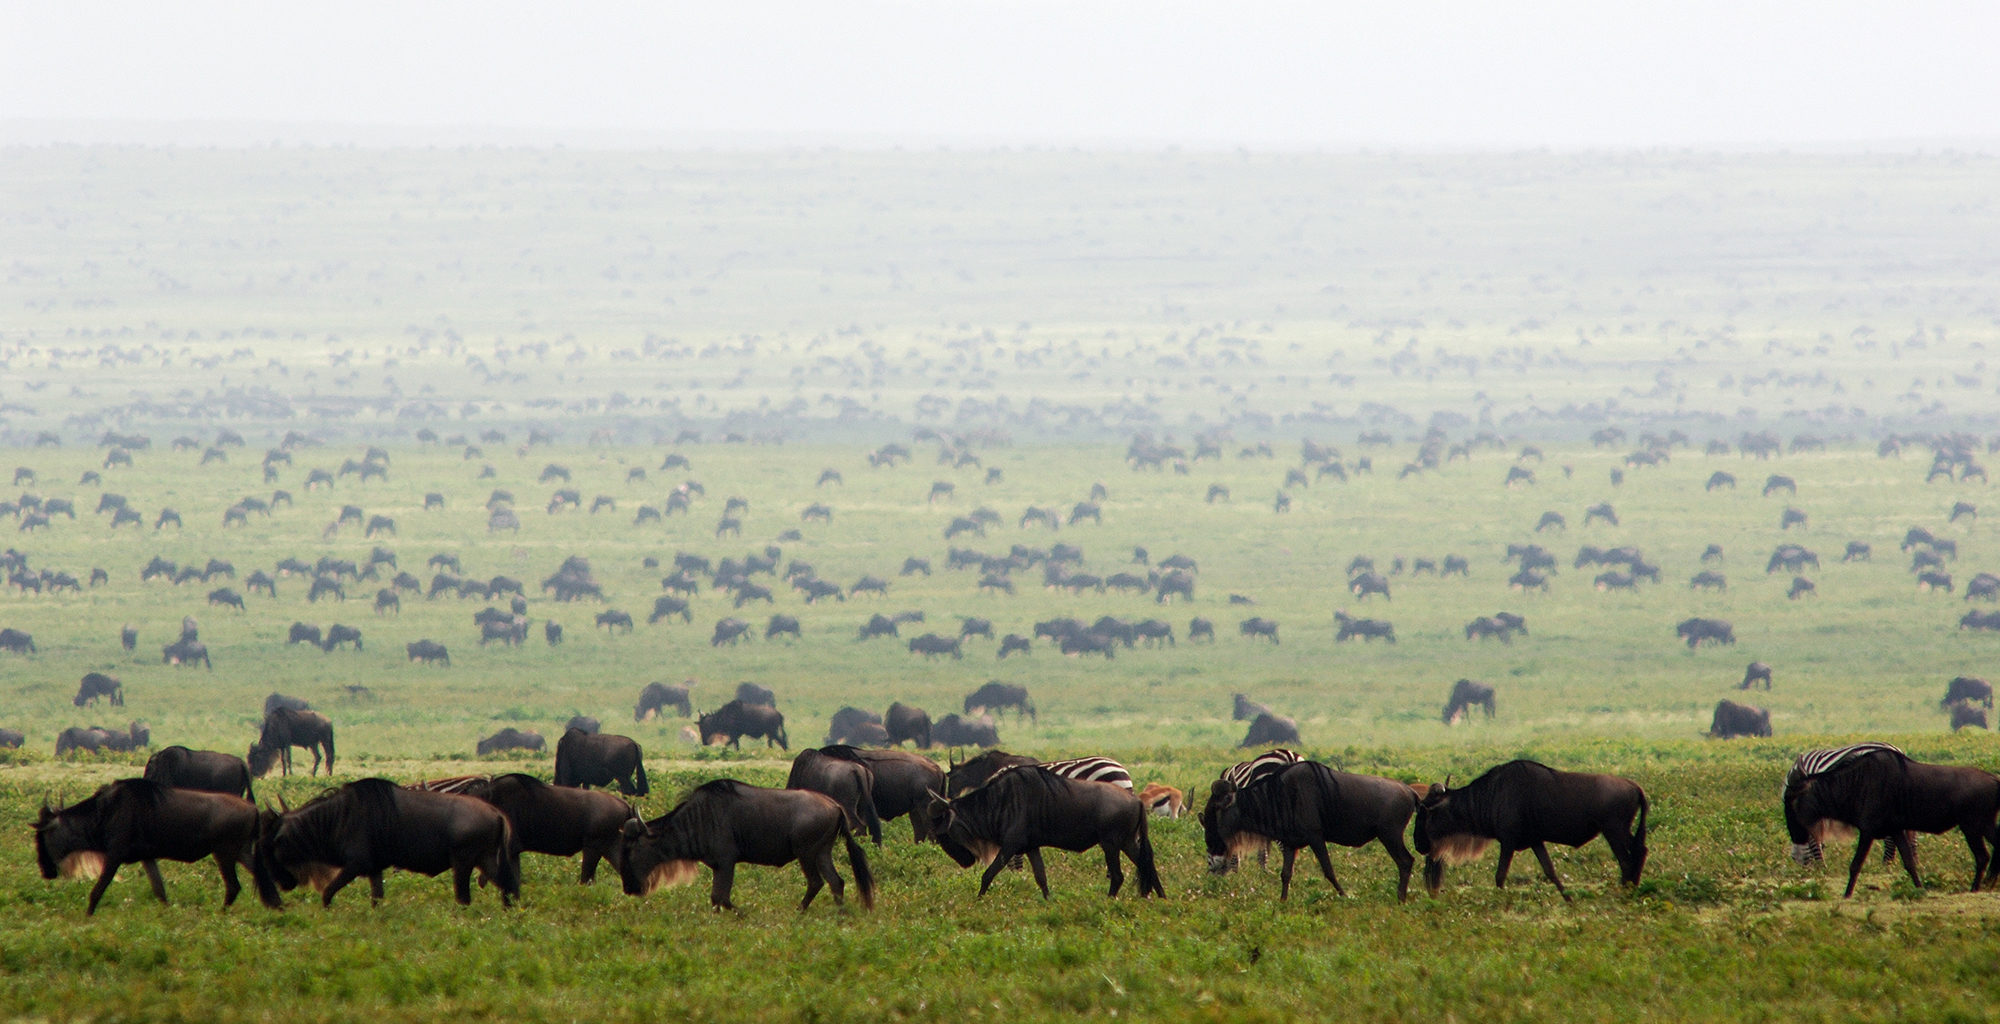 Tanzania-Loliondo-Serengeti-Wildlife-Migration